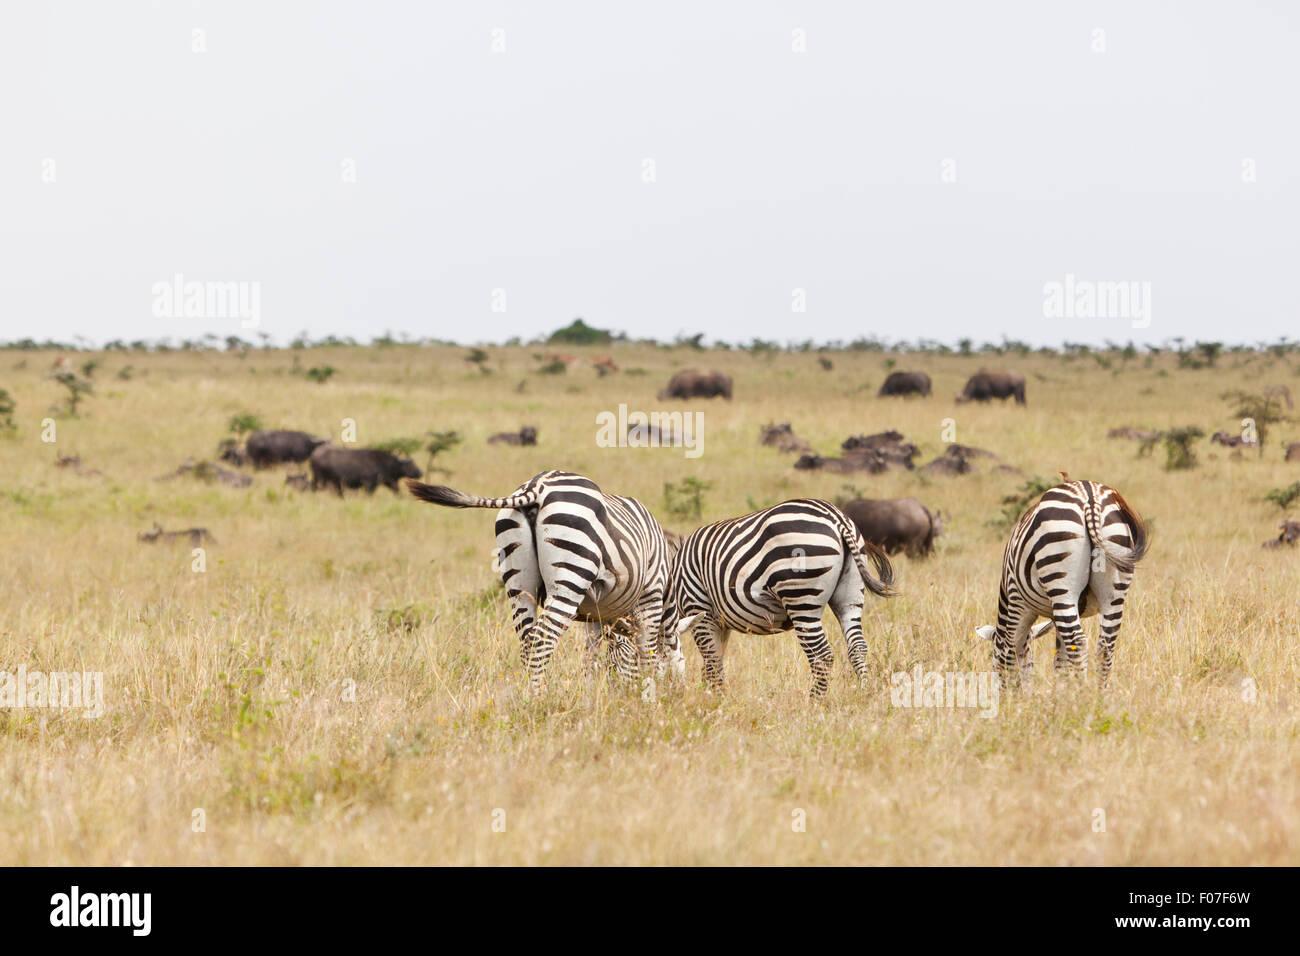 Zebras and Buffalos in Nairobi National Park in Kenya. - Stock Image